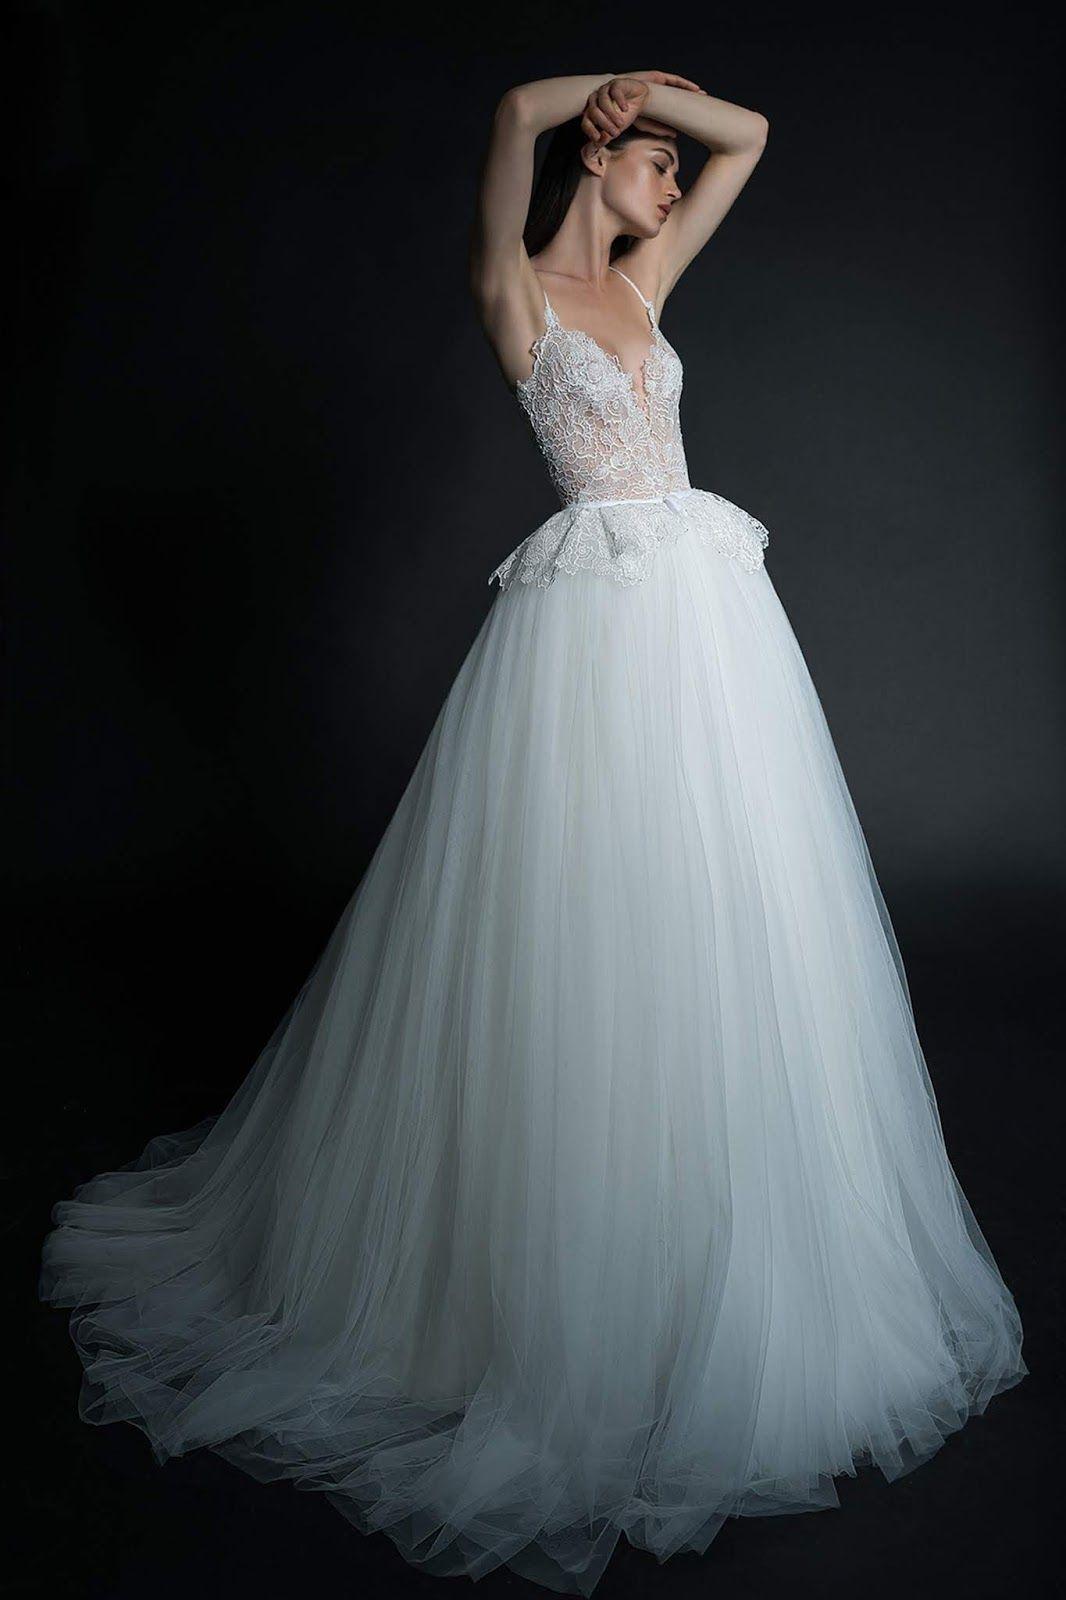 Simply Beautiful Bridal Gowns Inbal Dror August 6 2018 Zsazsa Bellagio Like No Other Inbal Dror Wedding Dresses Panache Bridal Wedding Dress Trends